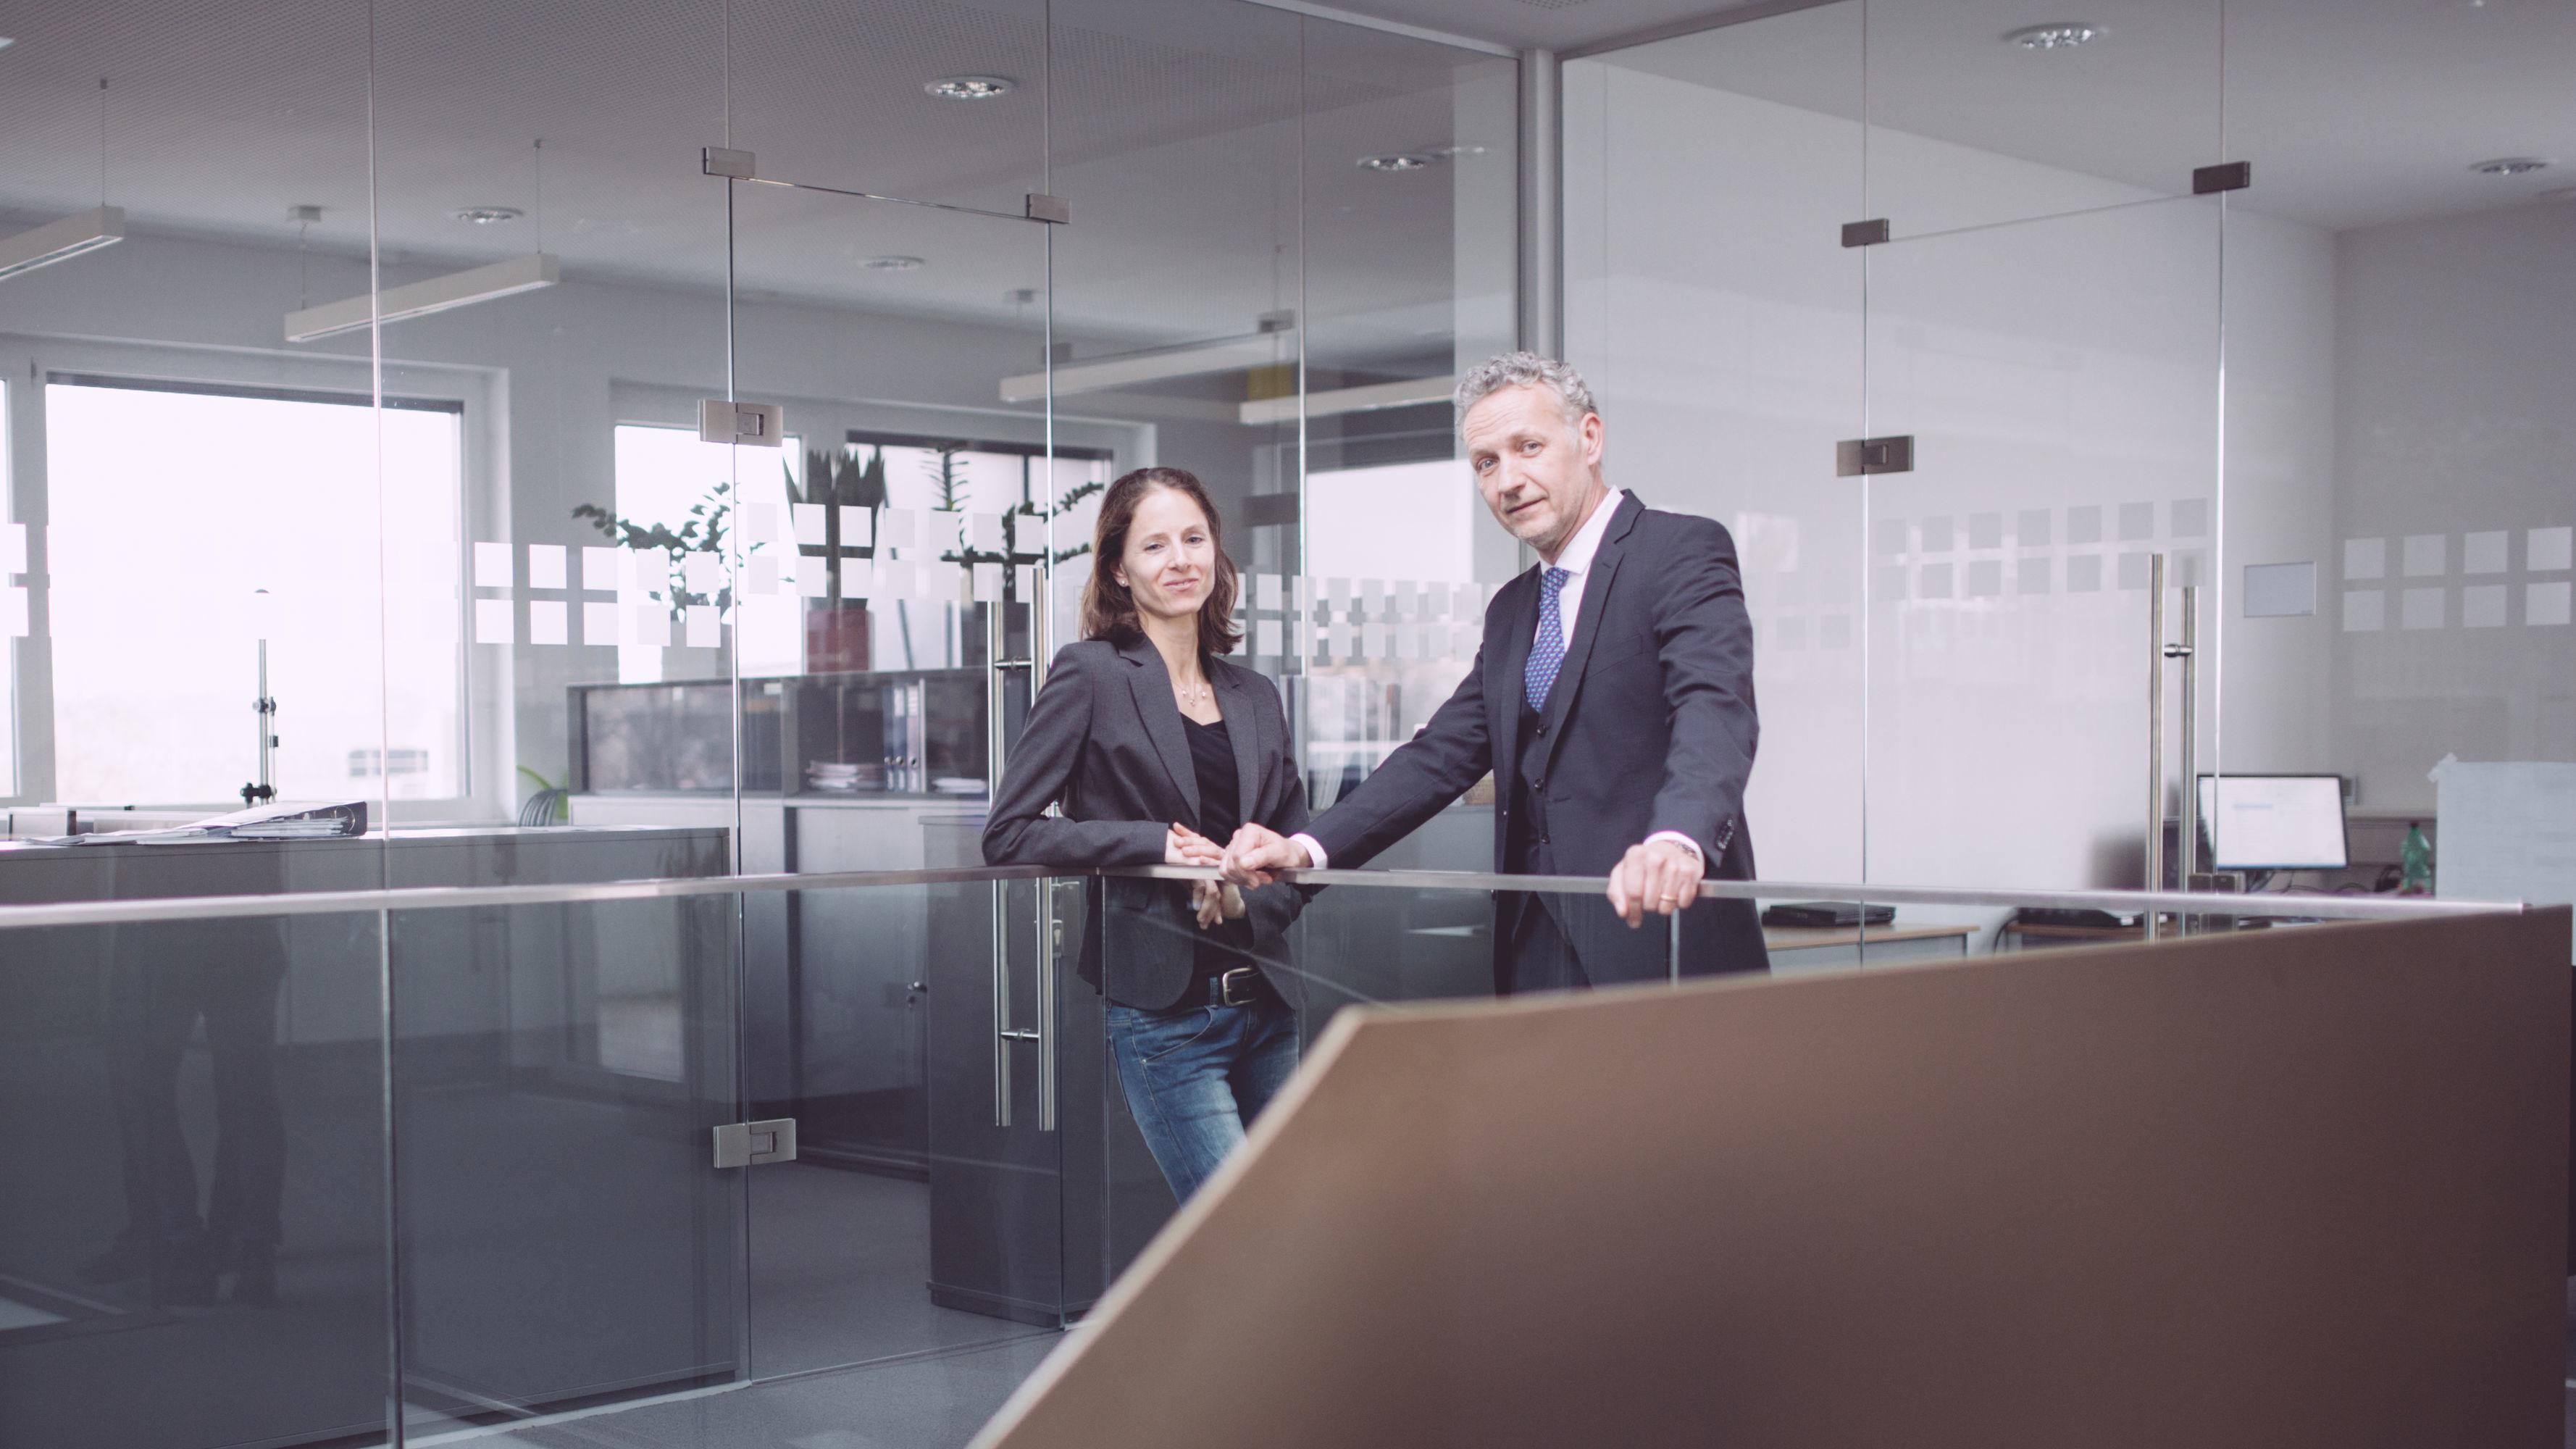 Mag. Nina Pildner-Steinburg und Dipl. Tech. Wolfgang Senner